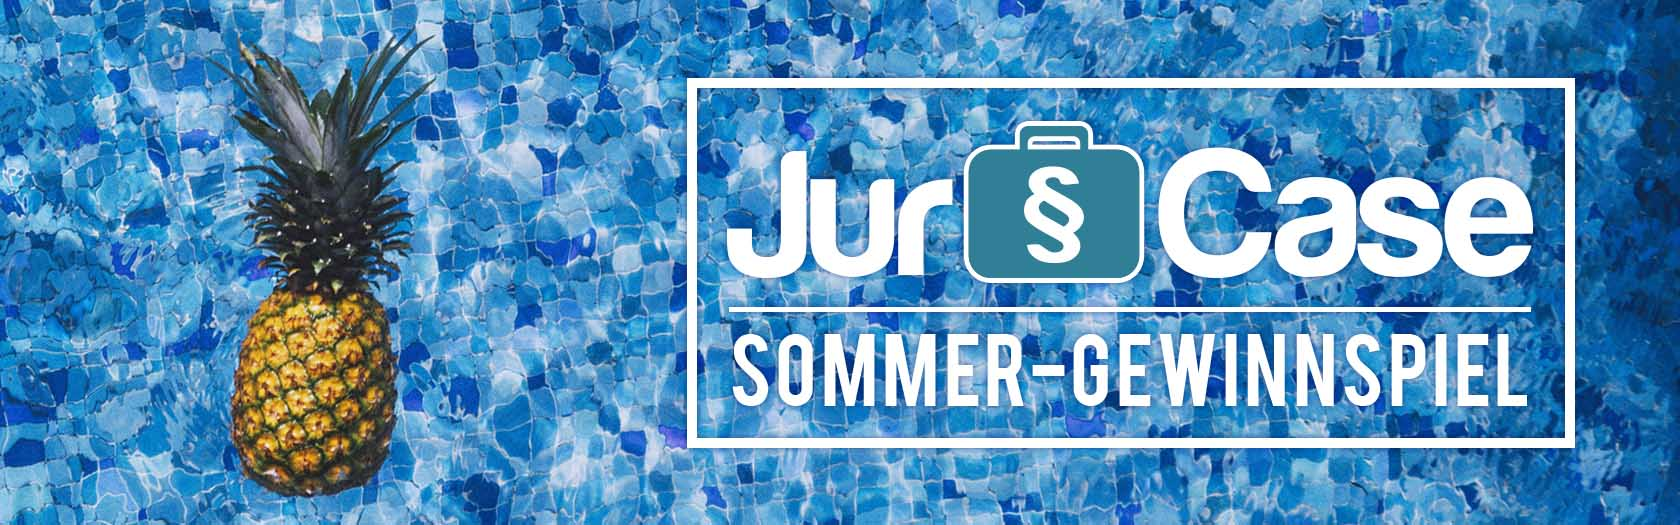 SommerGewinnspiel_HP